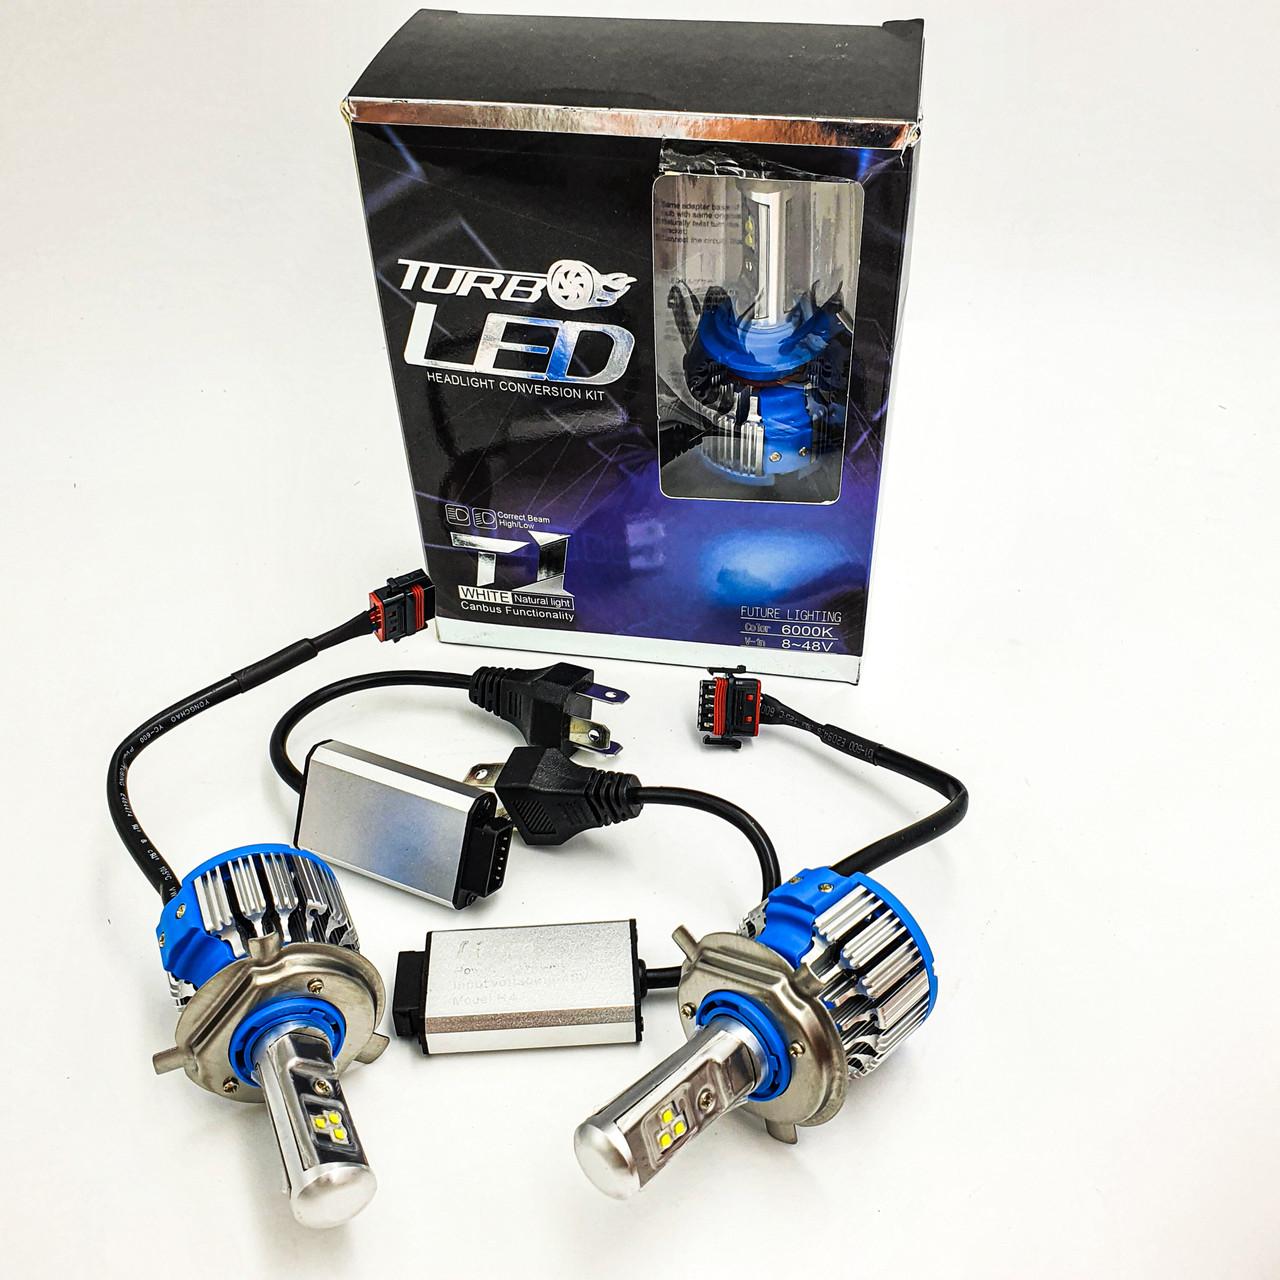 Комплект LED ламп H4 6000K 50W 12/24v с активным охлаждением TurboLed T1 2шт